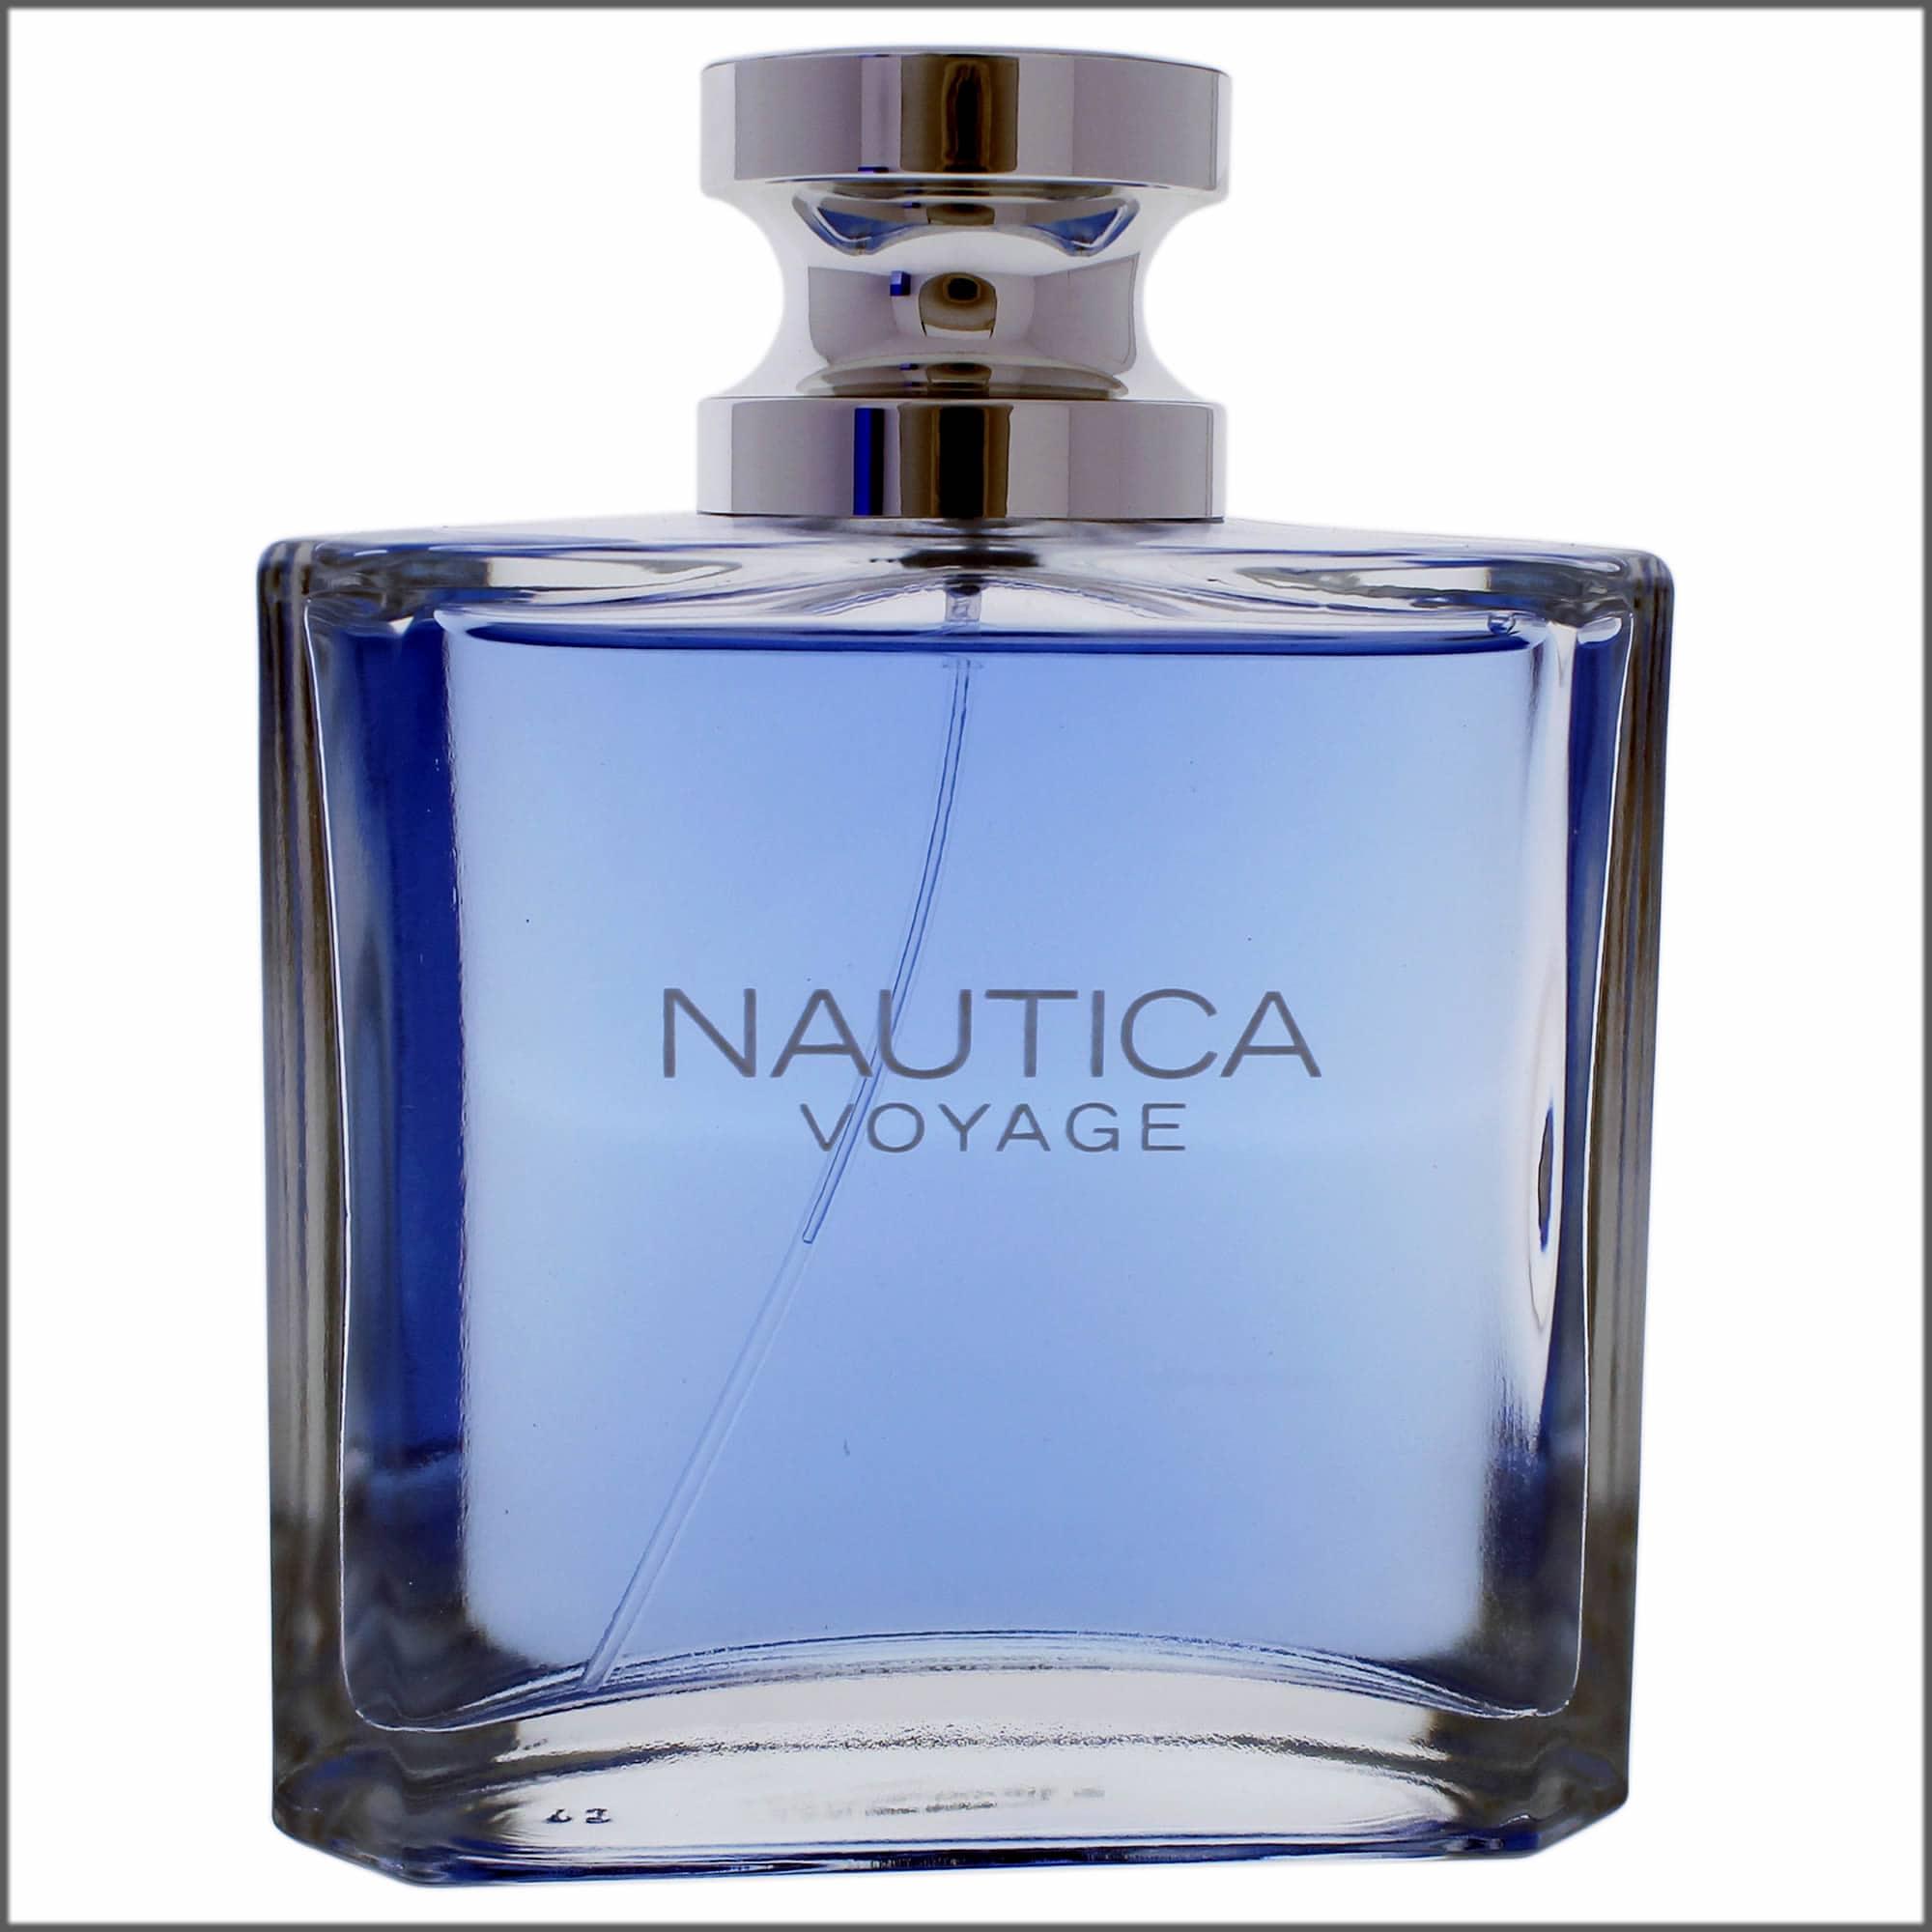 Nautica voyage scent for males